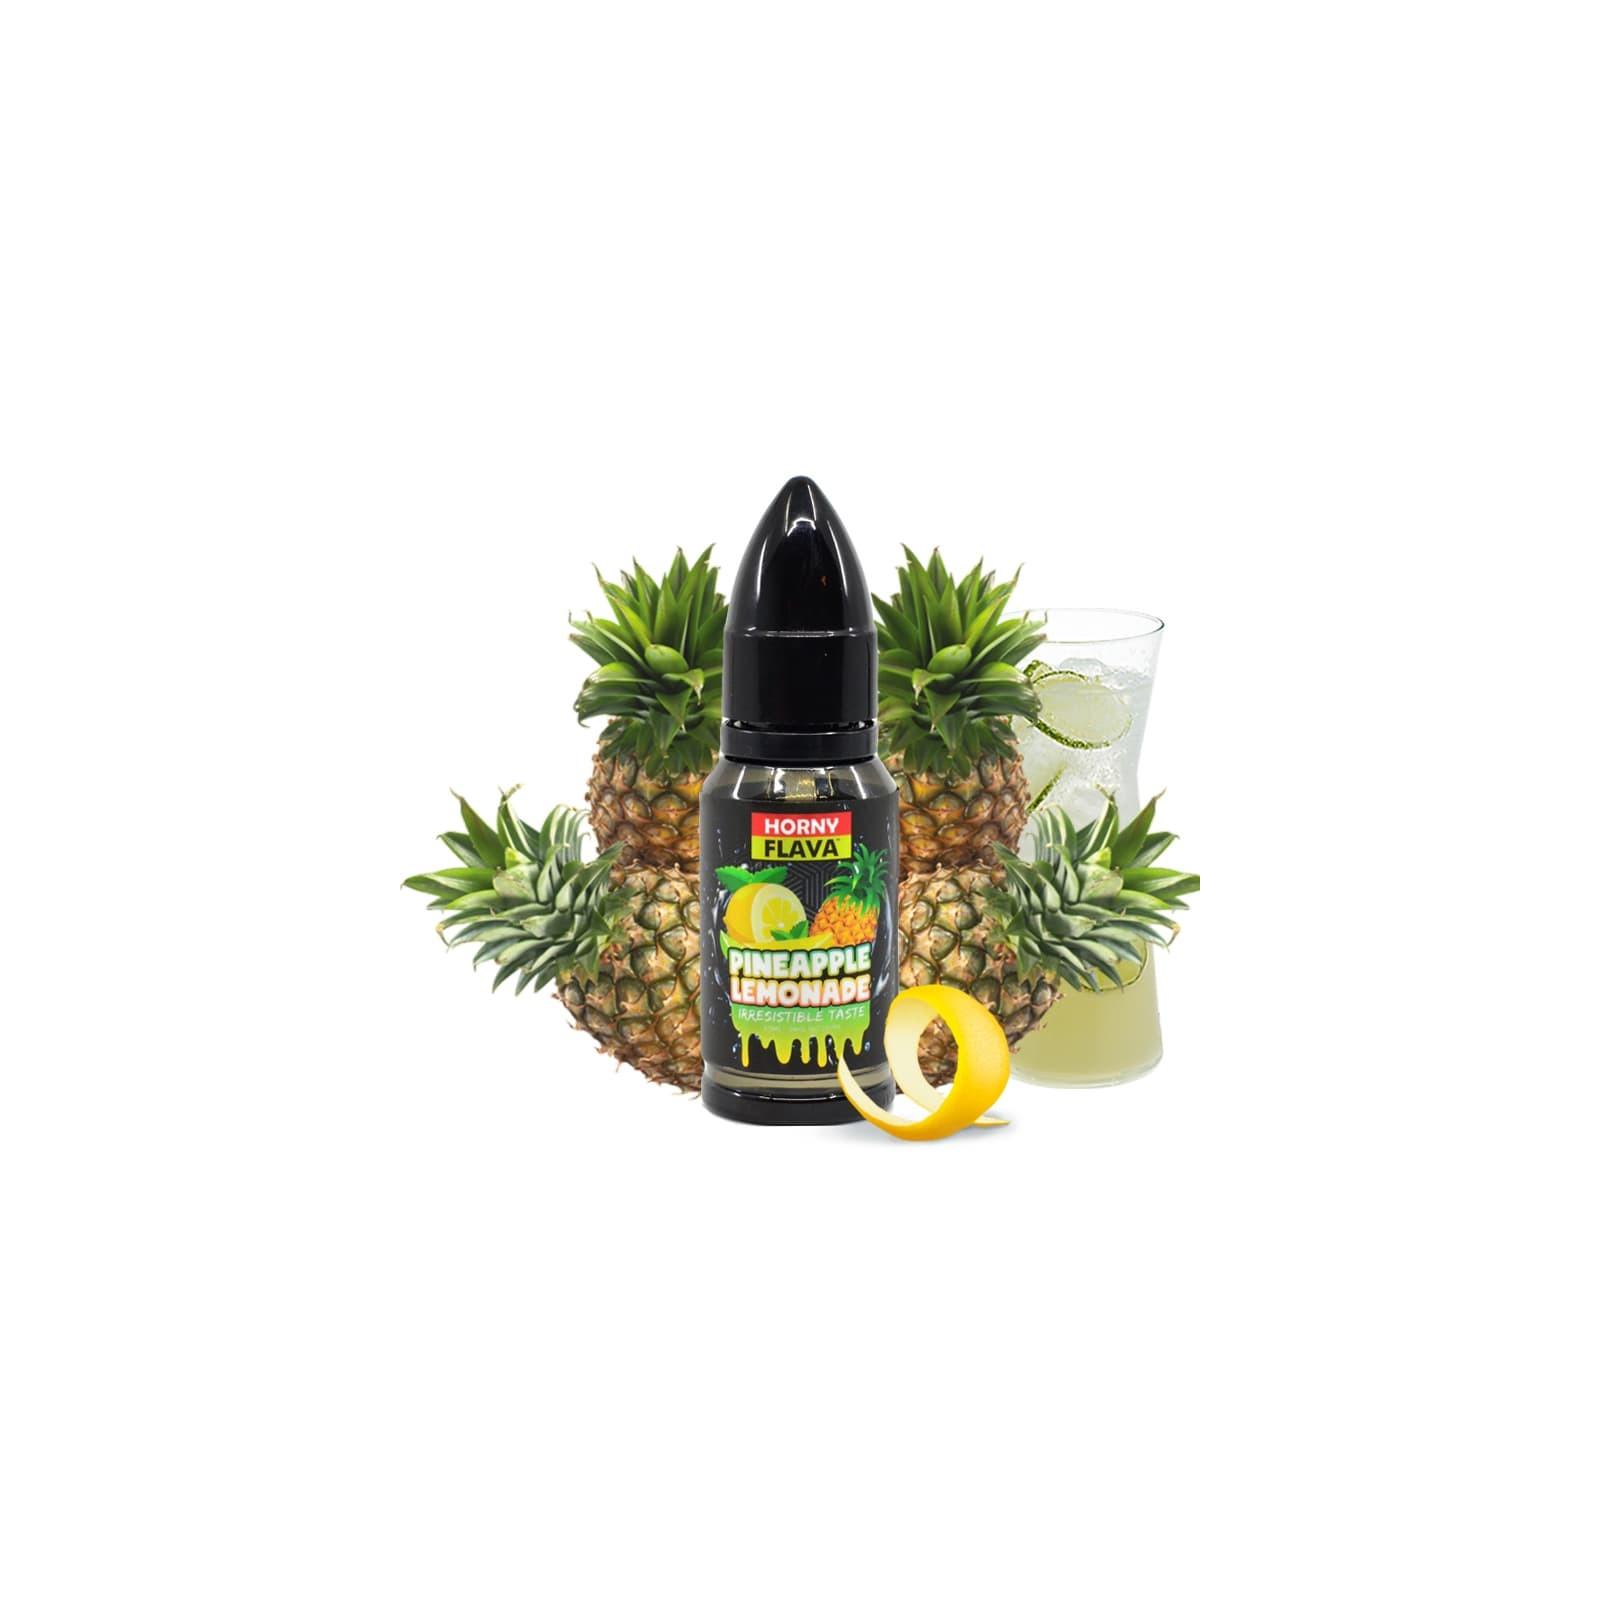 Pineapple Lemonade 65ml - Horny Flava